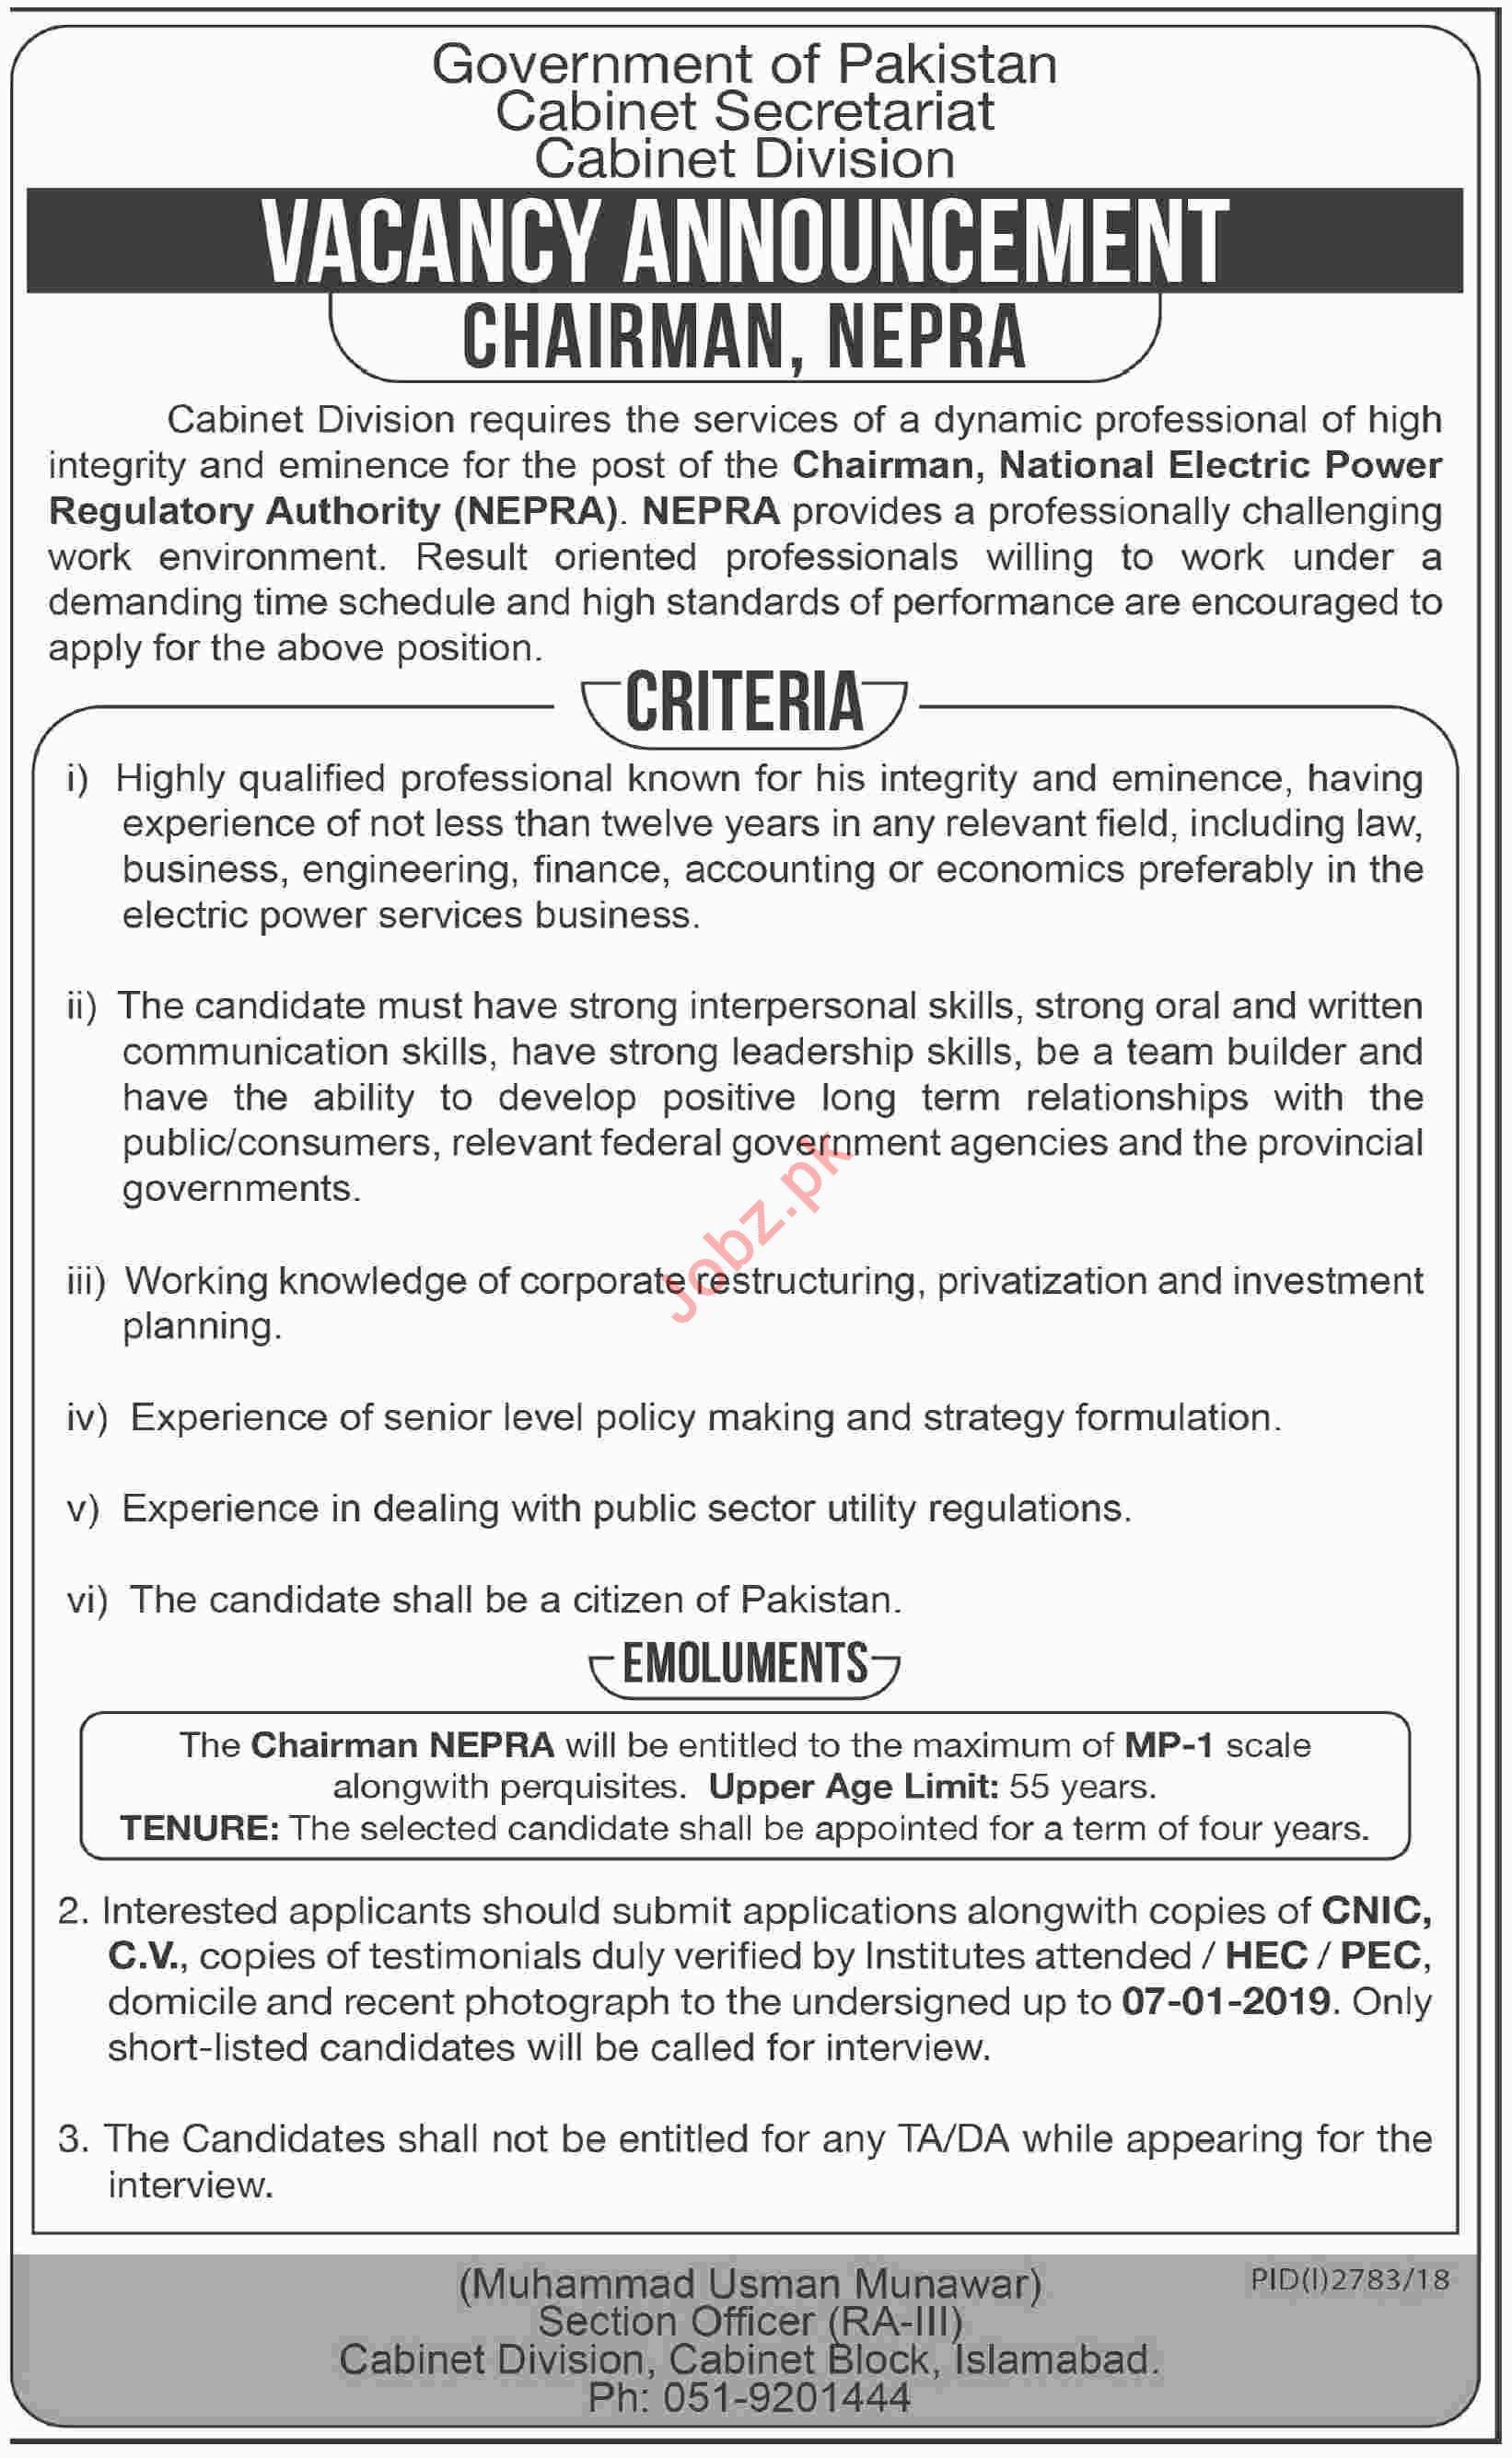 Chairman Job Opportunities at NEPRA